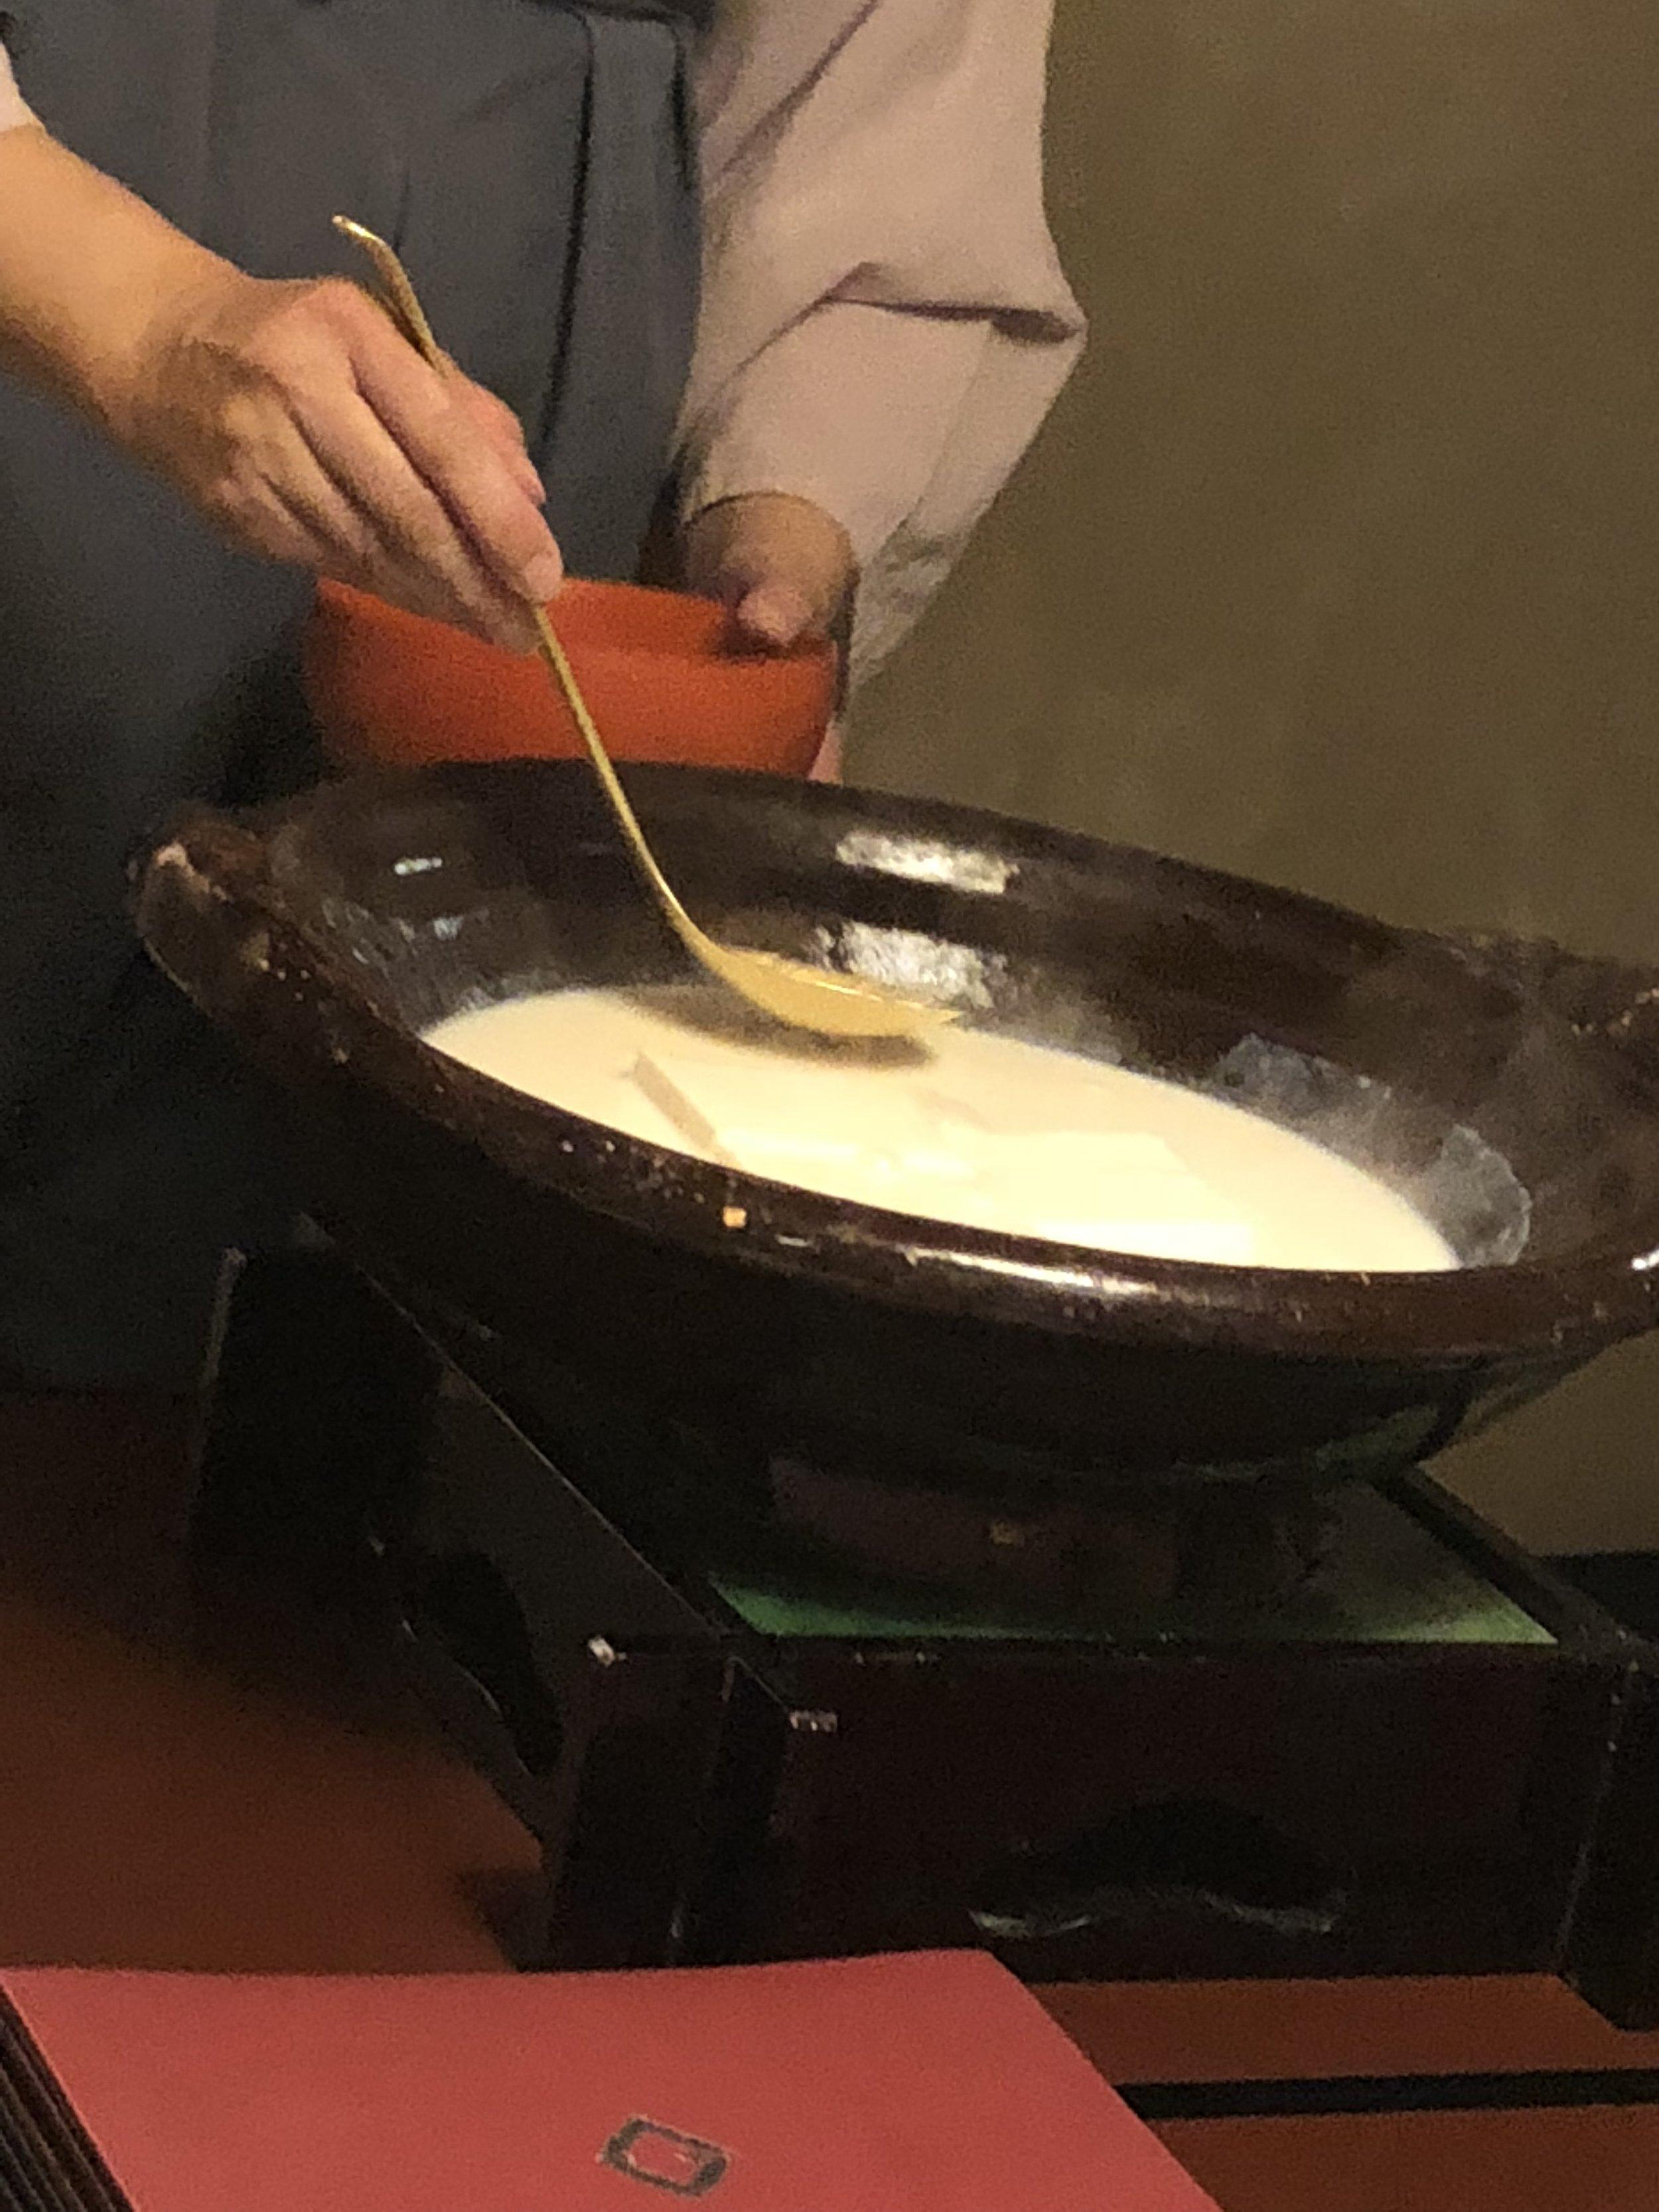 tofu serving from soymilk